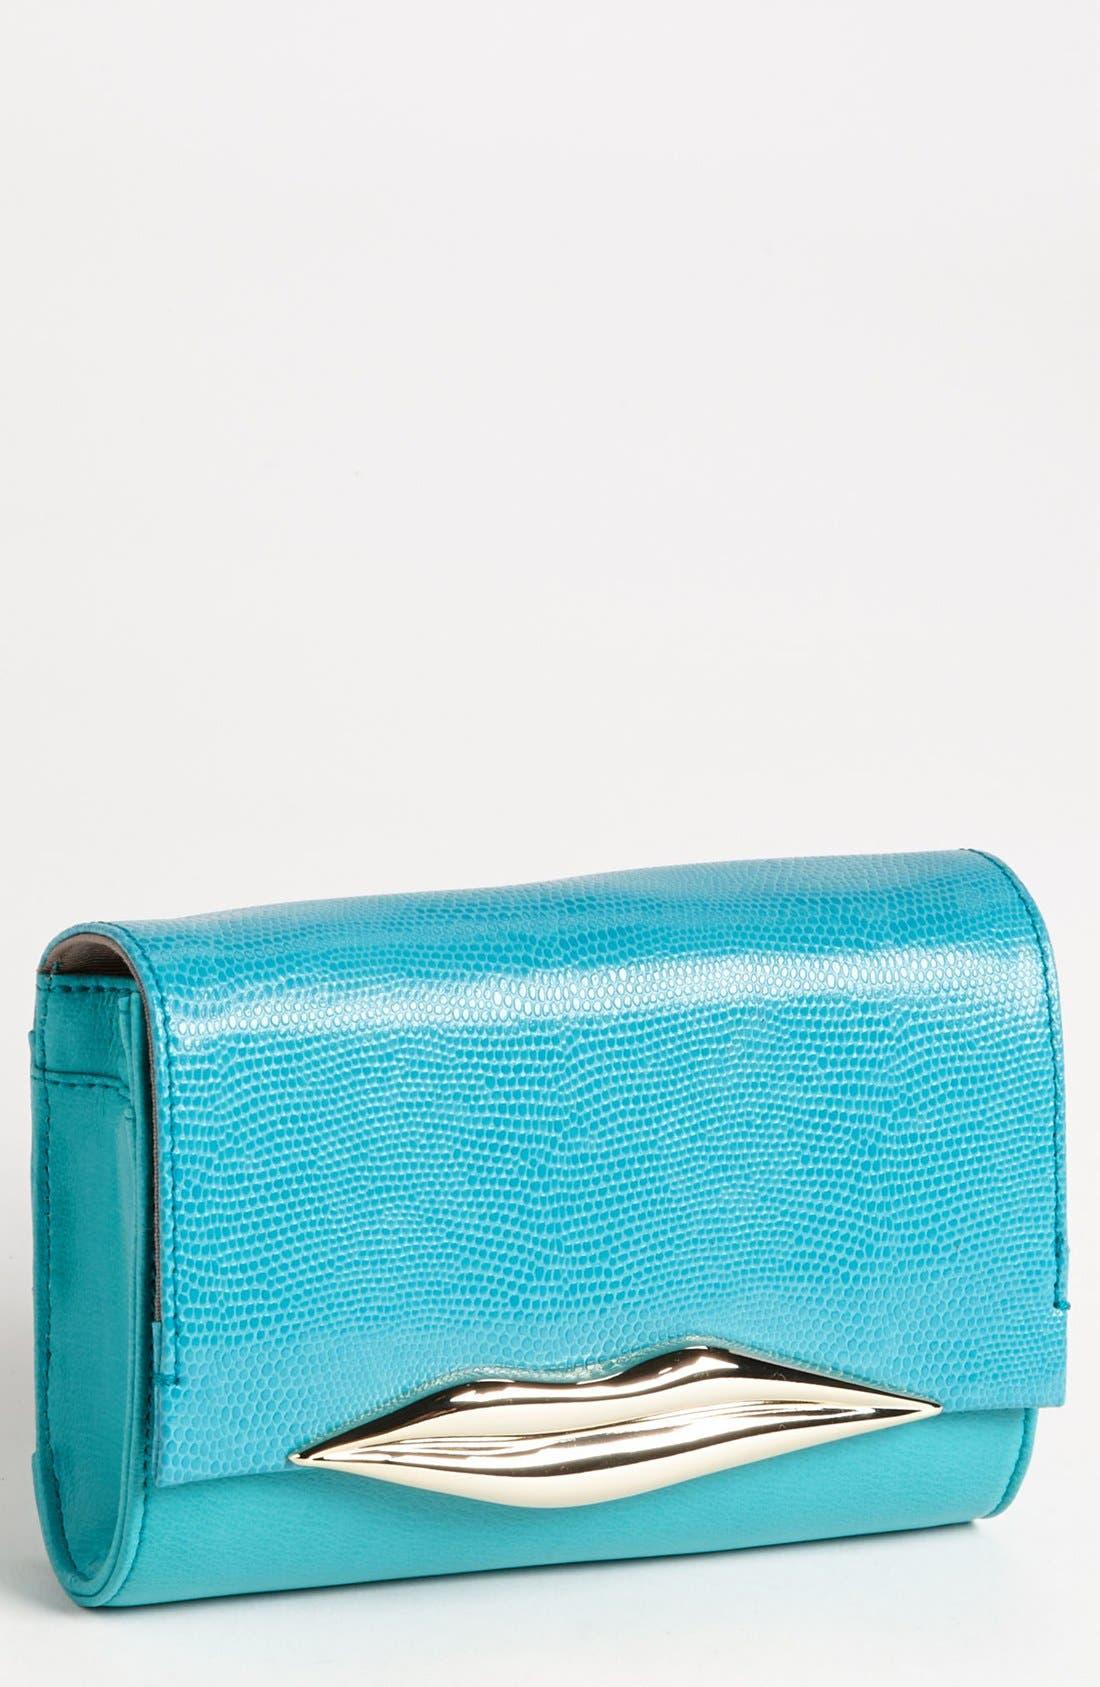 Main Image - Diane von Furstenberg 'Lips - Mini' Embossed Leather Clutch